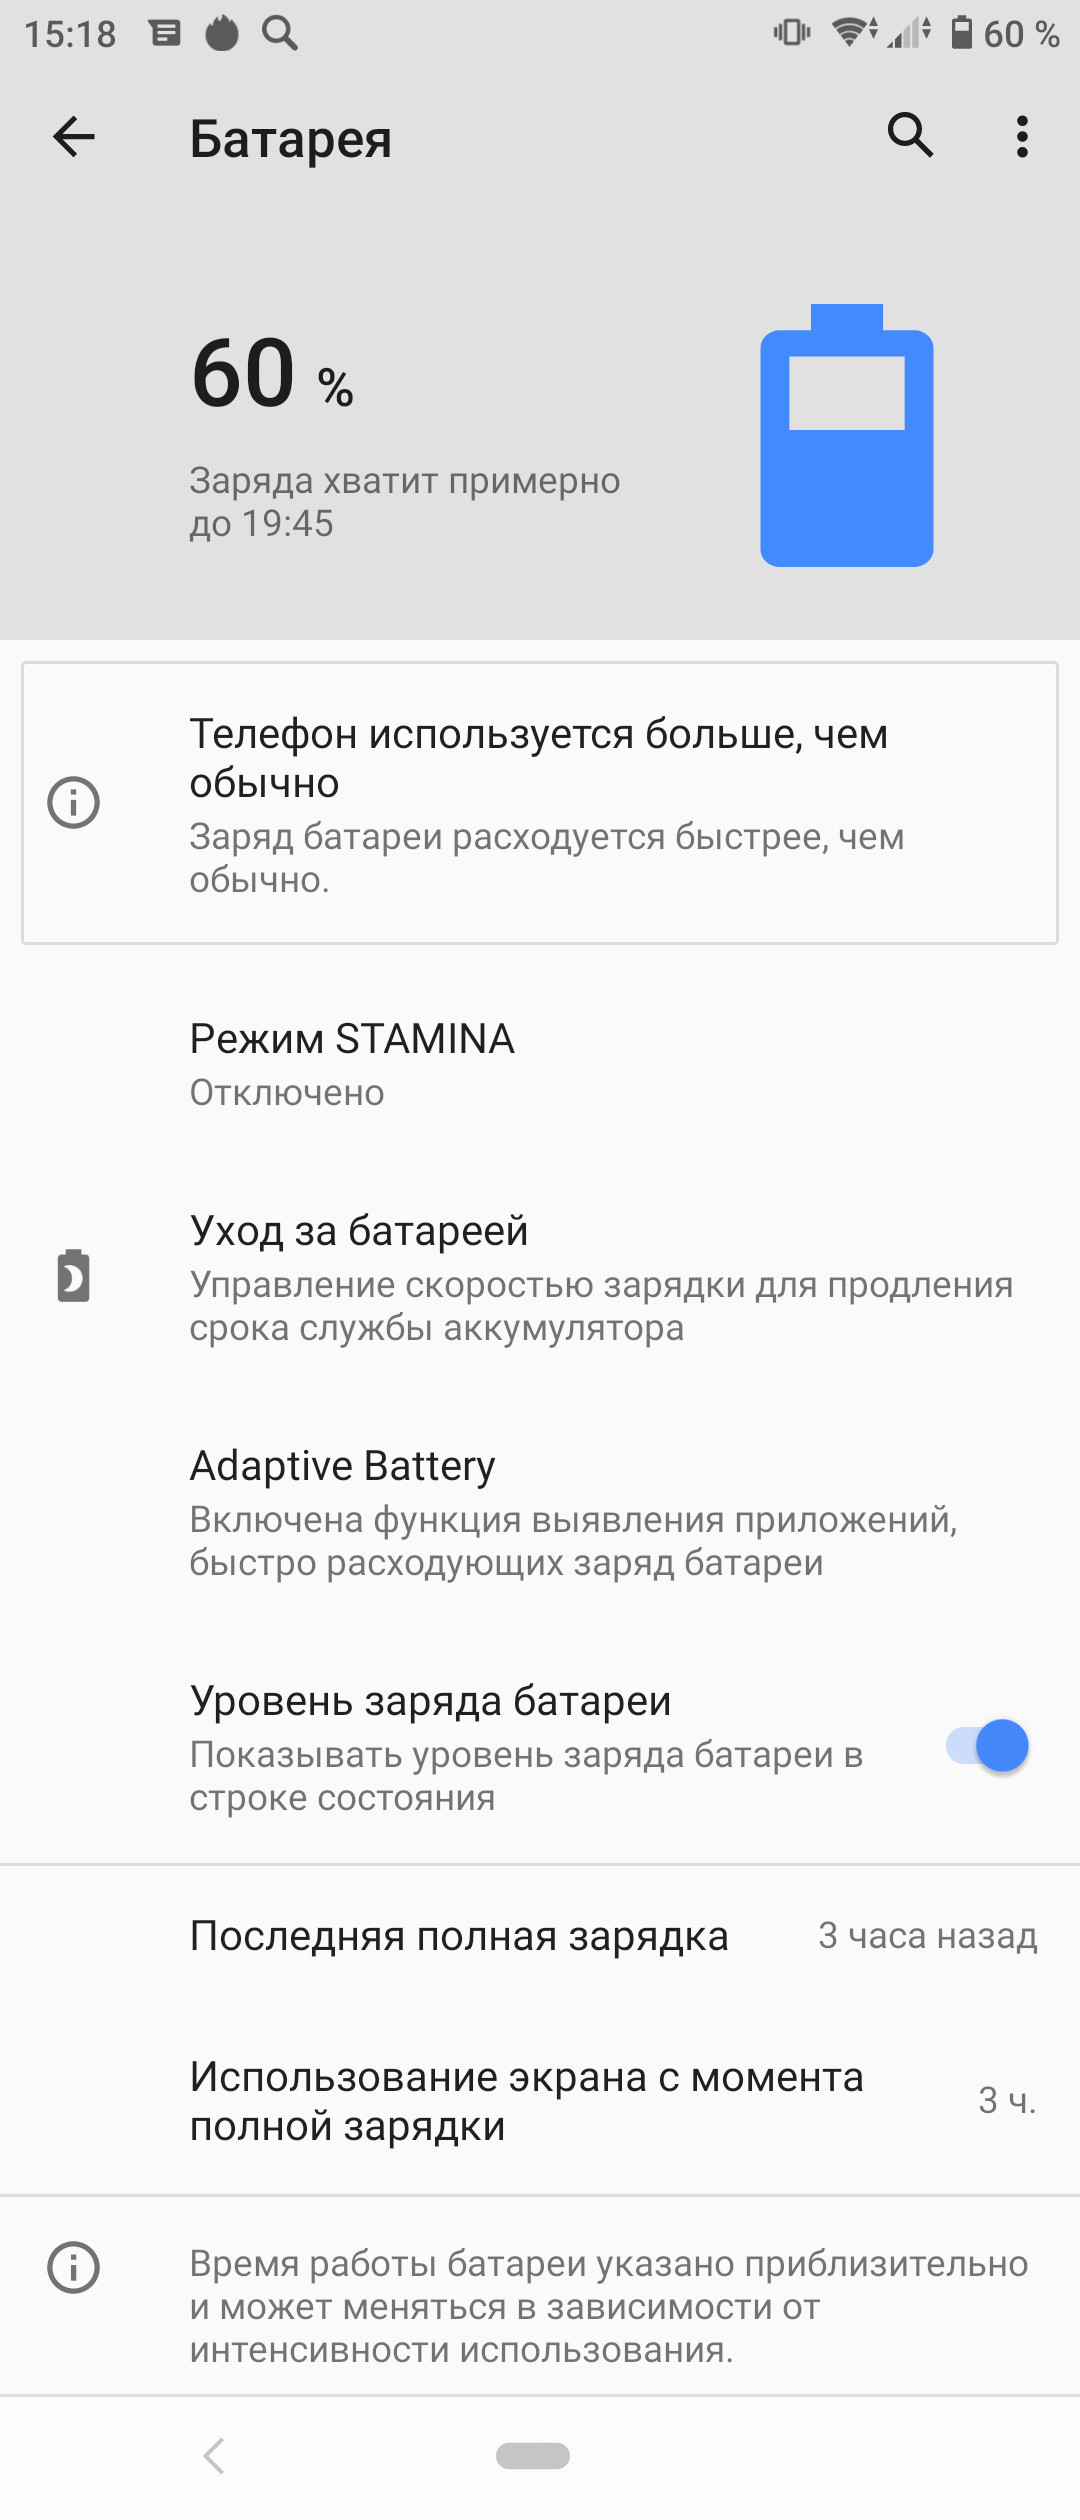 Обзор Sony Xperia 5: компактный смартфон с большим экраном Другие устройства  - obzor_sony_xperia_5_kompakt_s_bolshim_ekranom_picture34_2